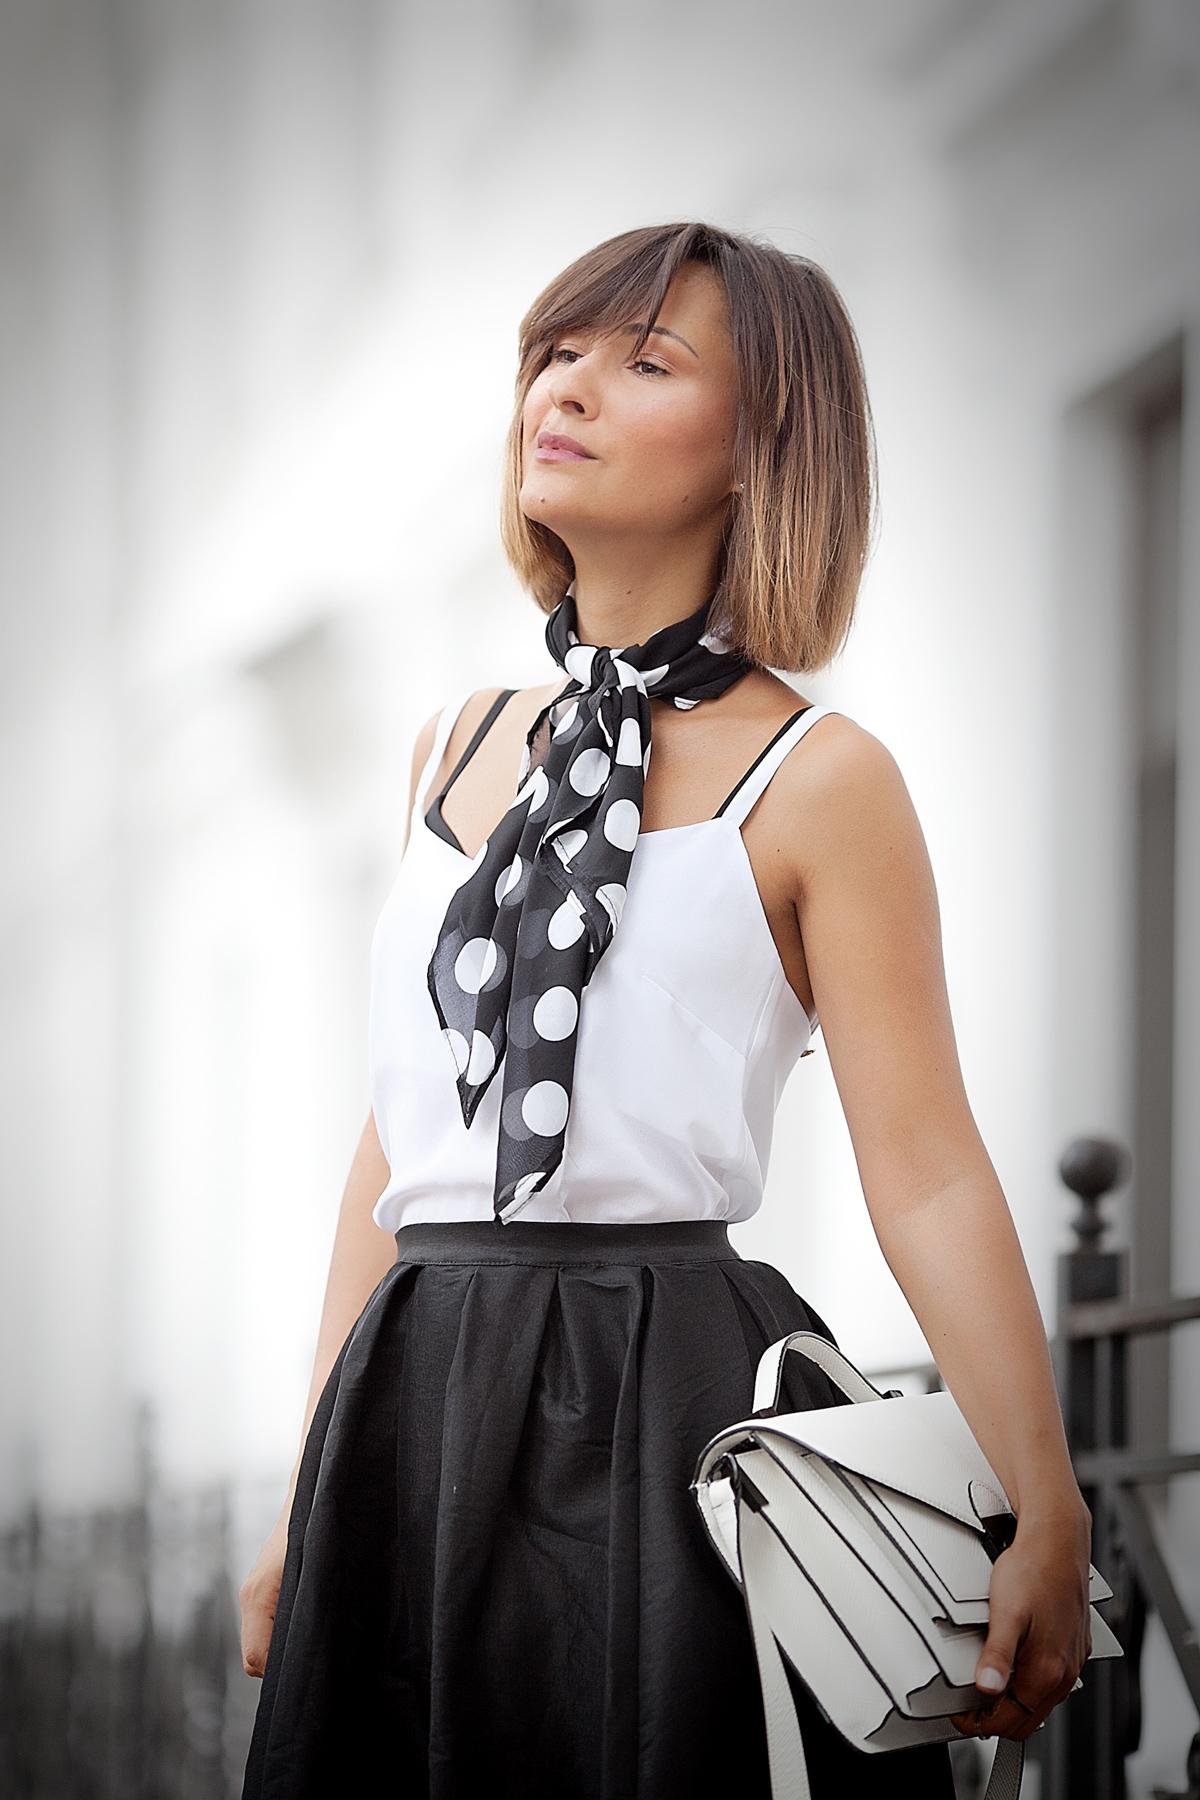 polka-dot-scarf-outfit-fashion-blogger-galantgirl